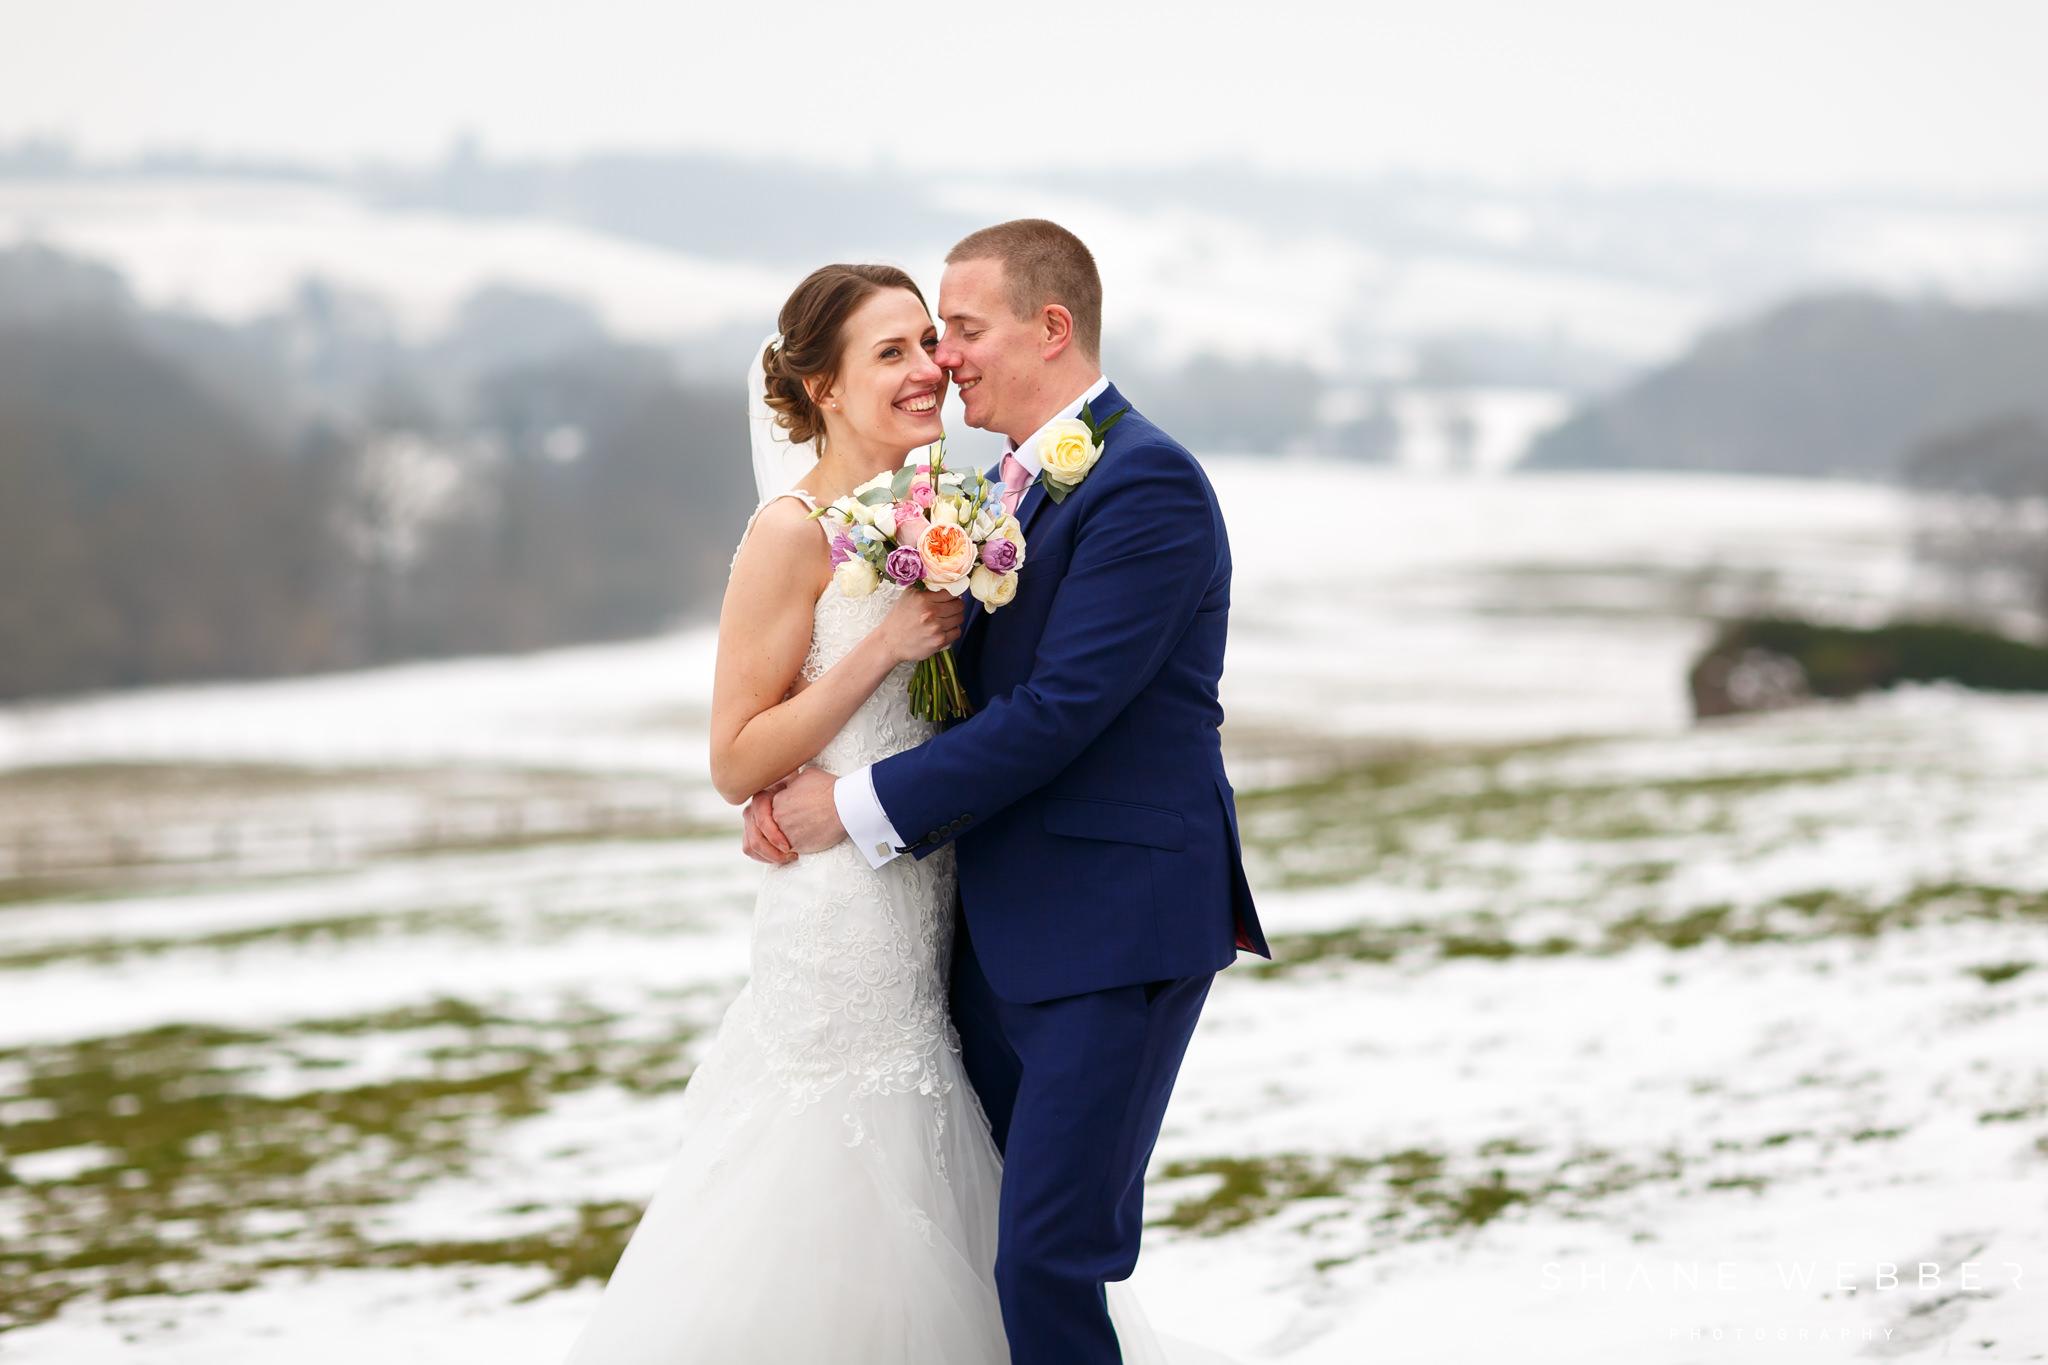 Winter wedding flowers Woodhall hotel and spa Florist harrogate